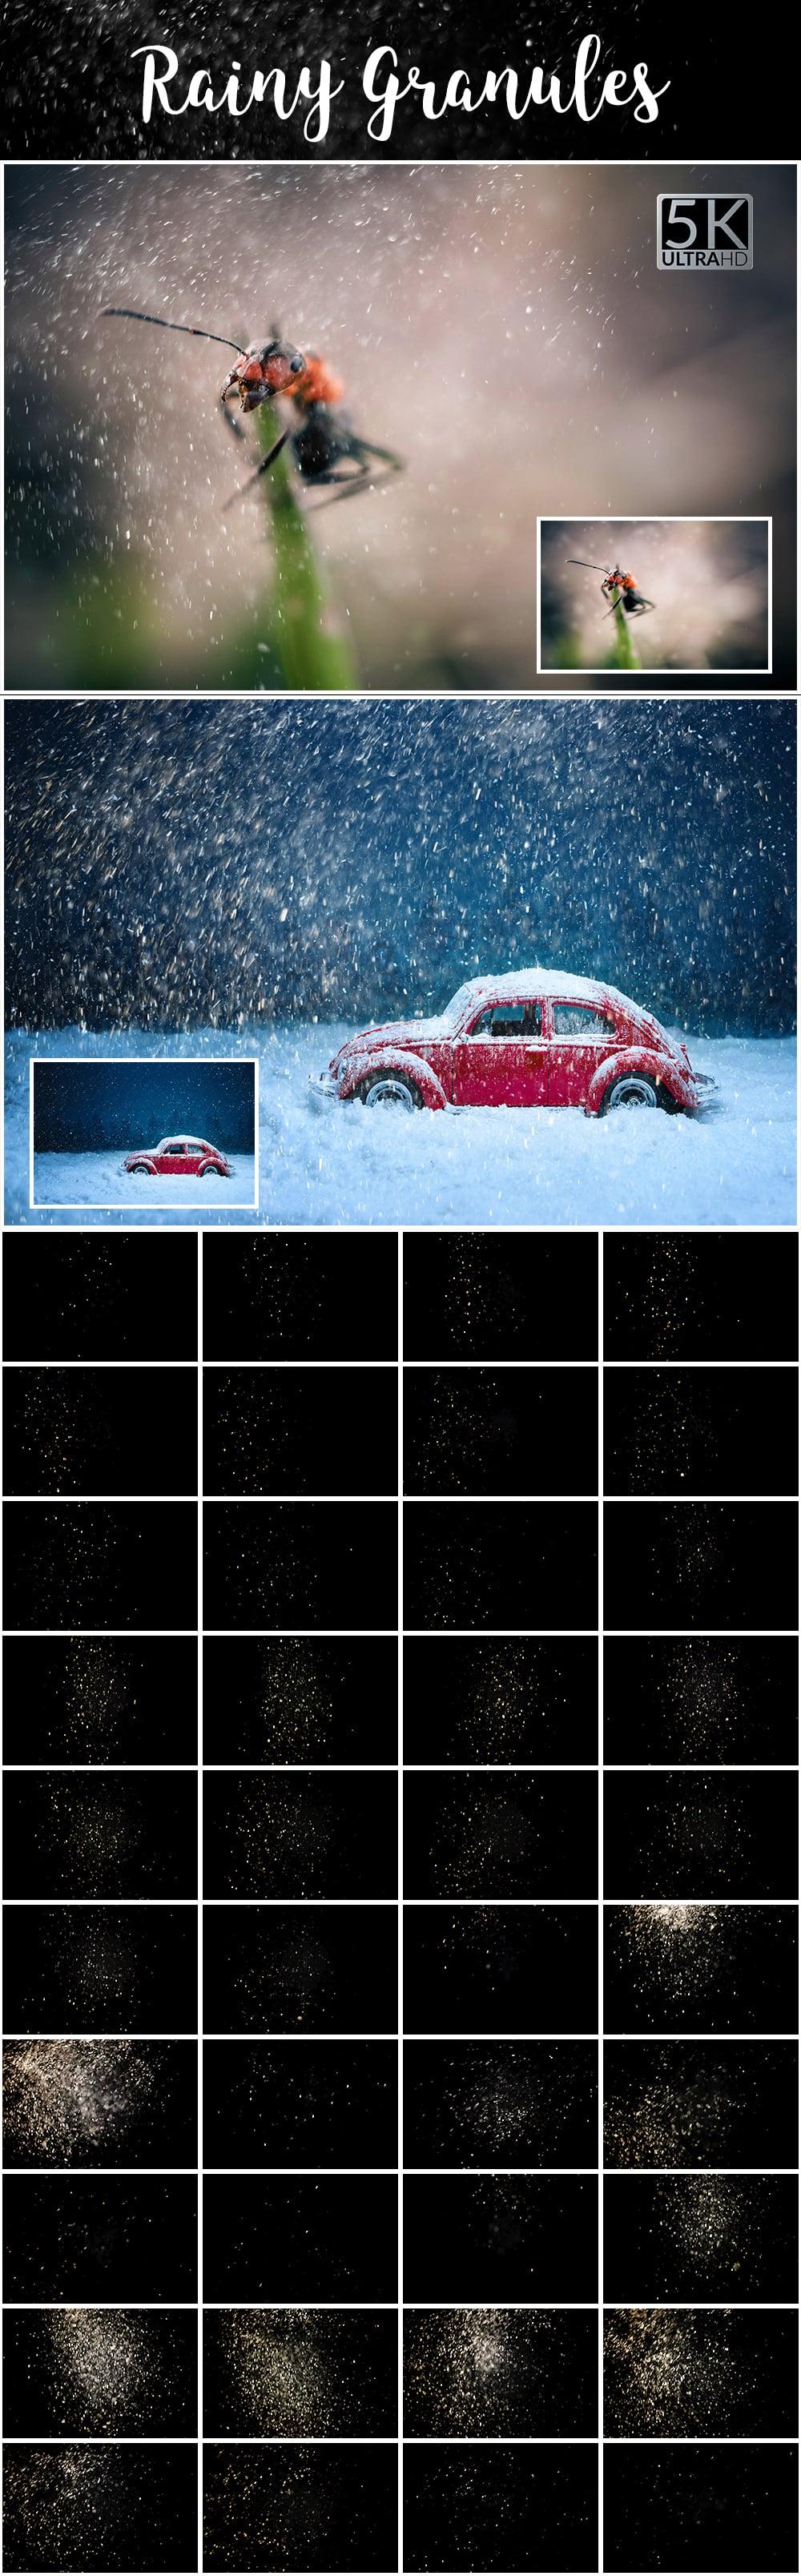 1100 Photoshop Overlays Mega Pack - Extended License - 22 Rainy Granules